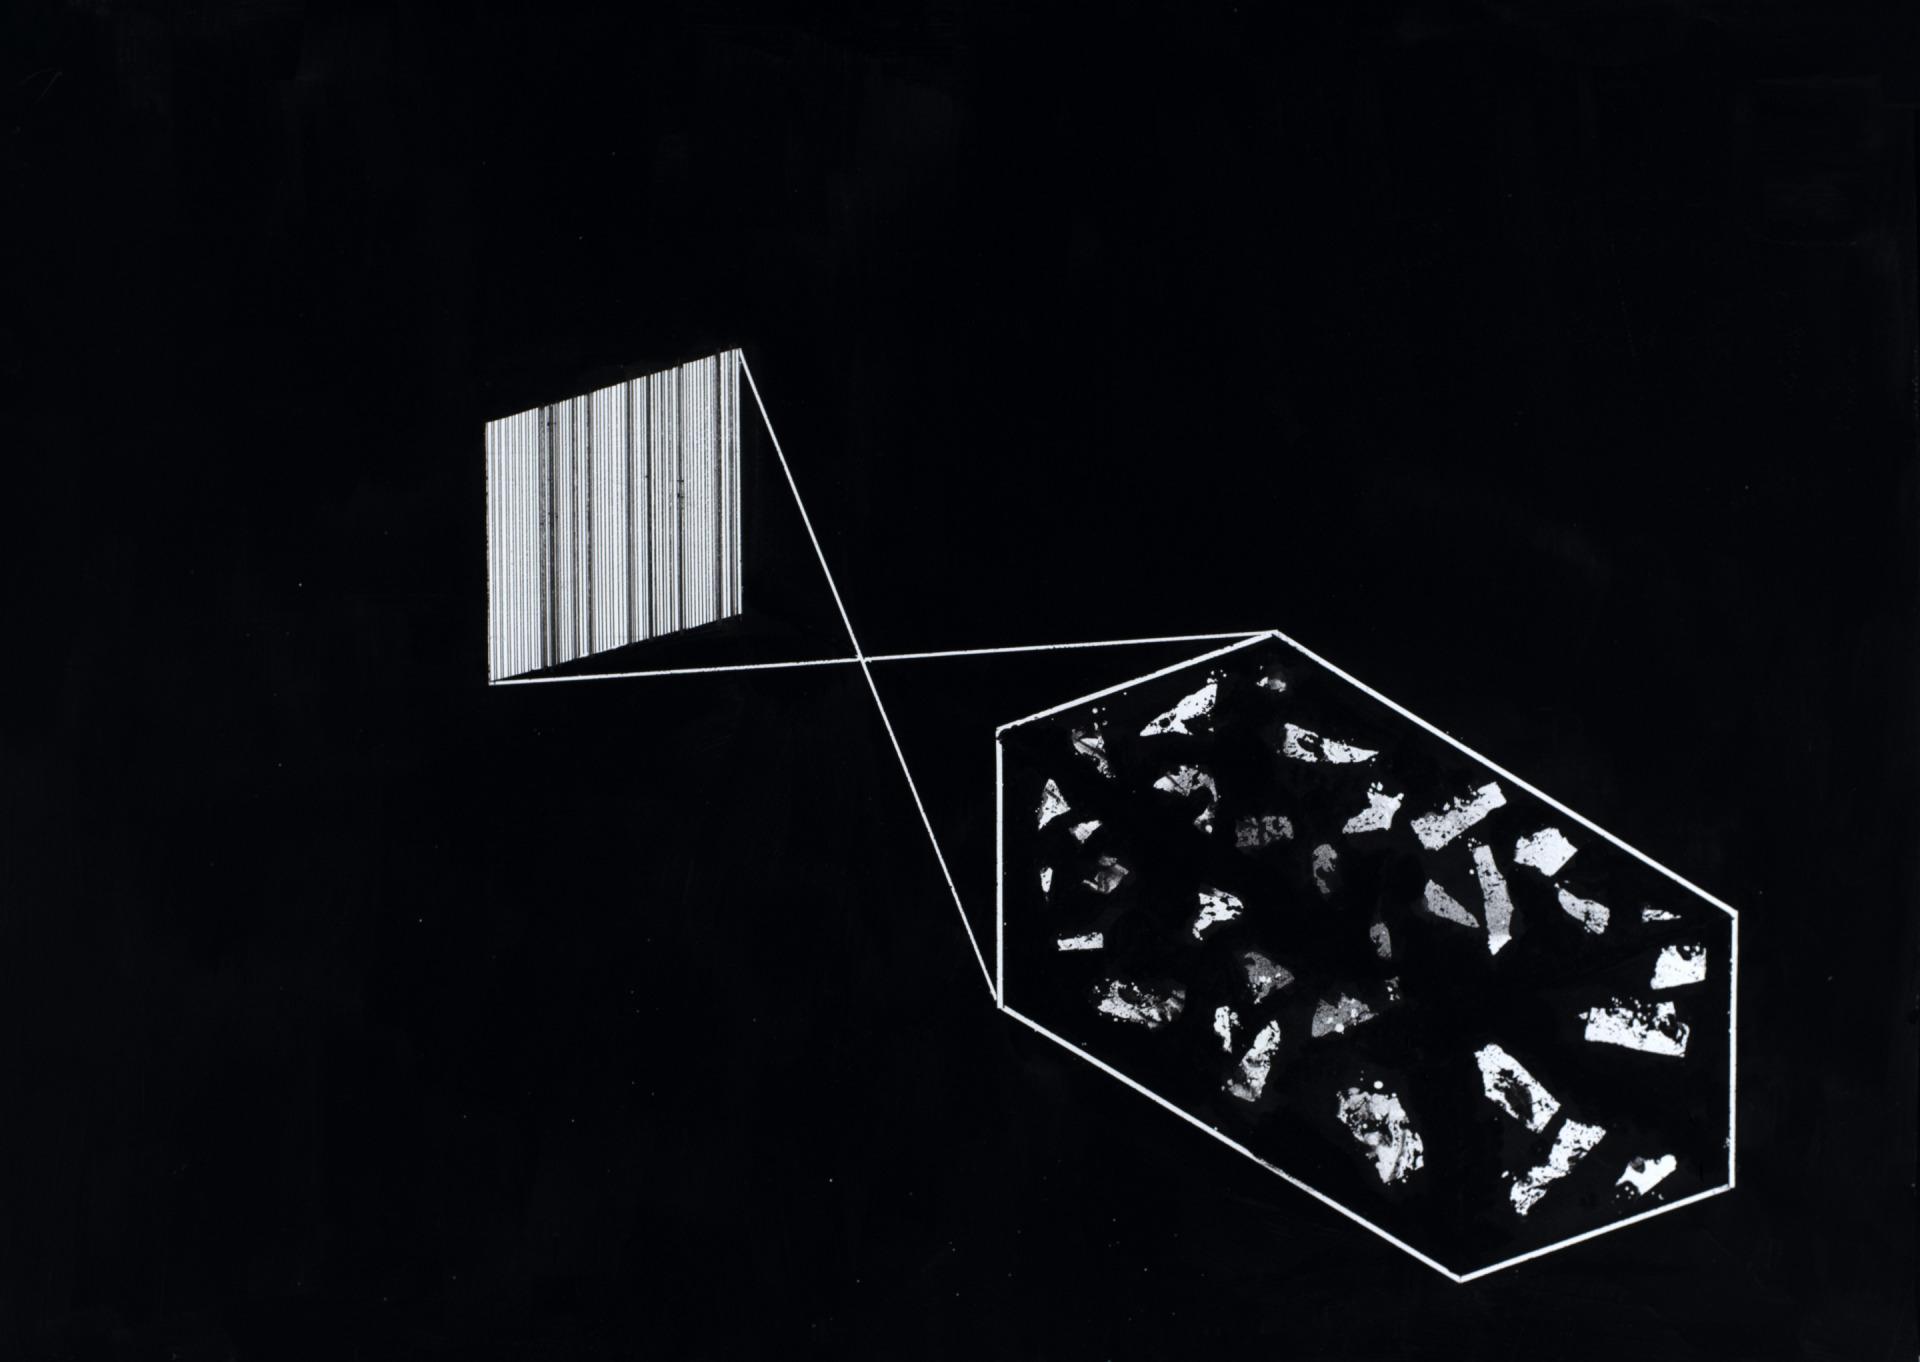 Contemporary art from Gyula Sági | op240321. 4